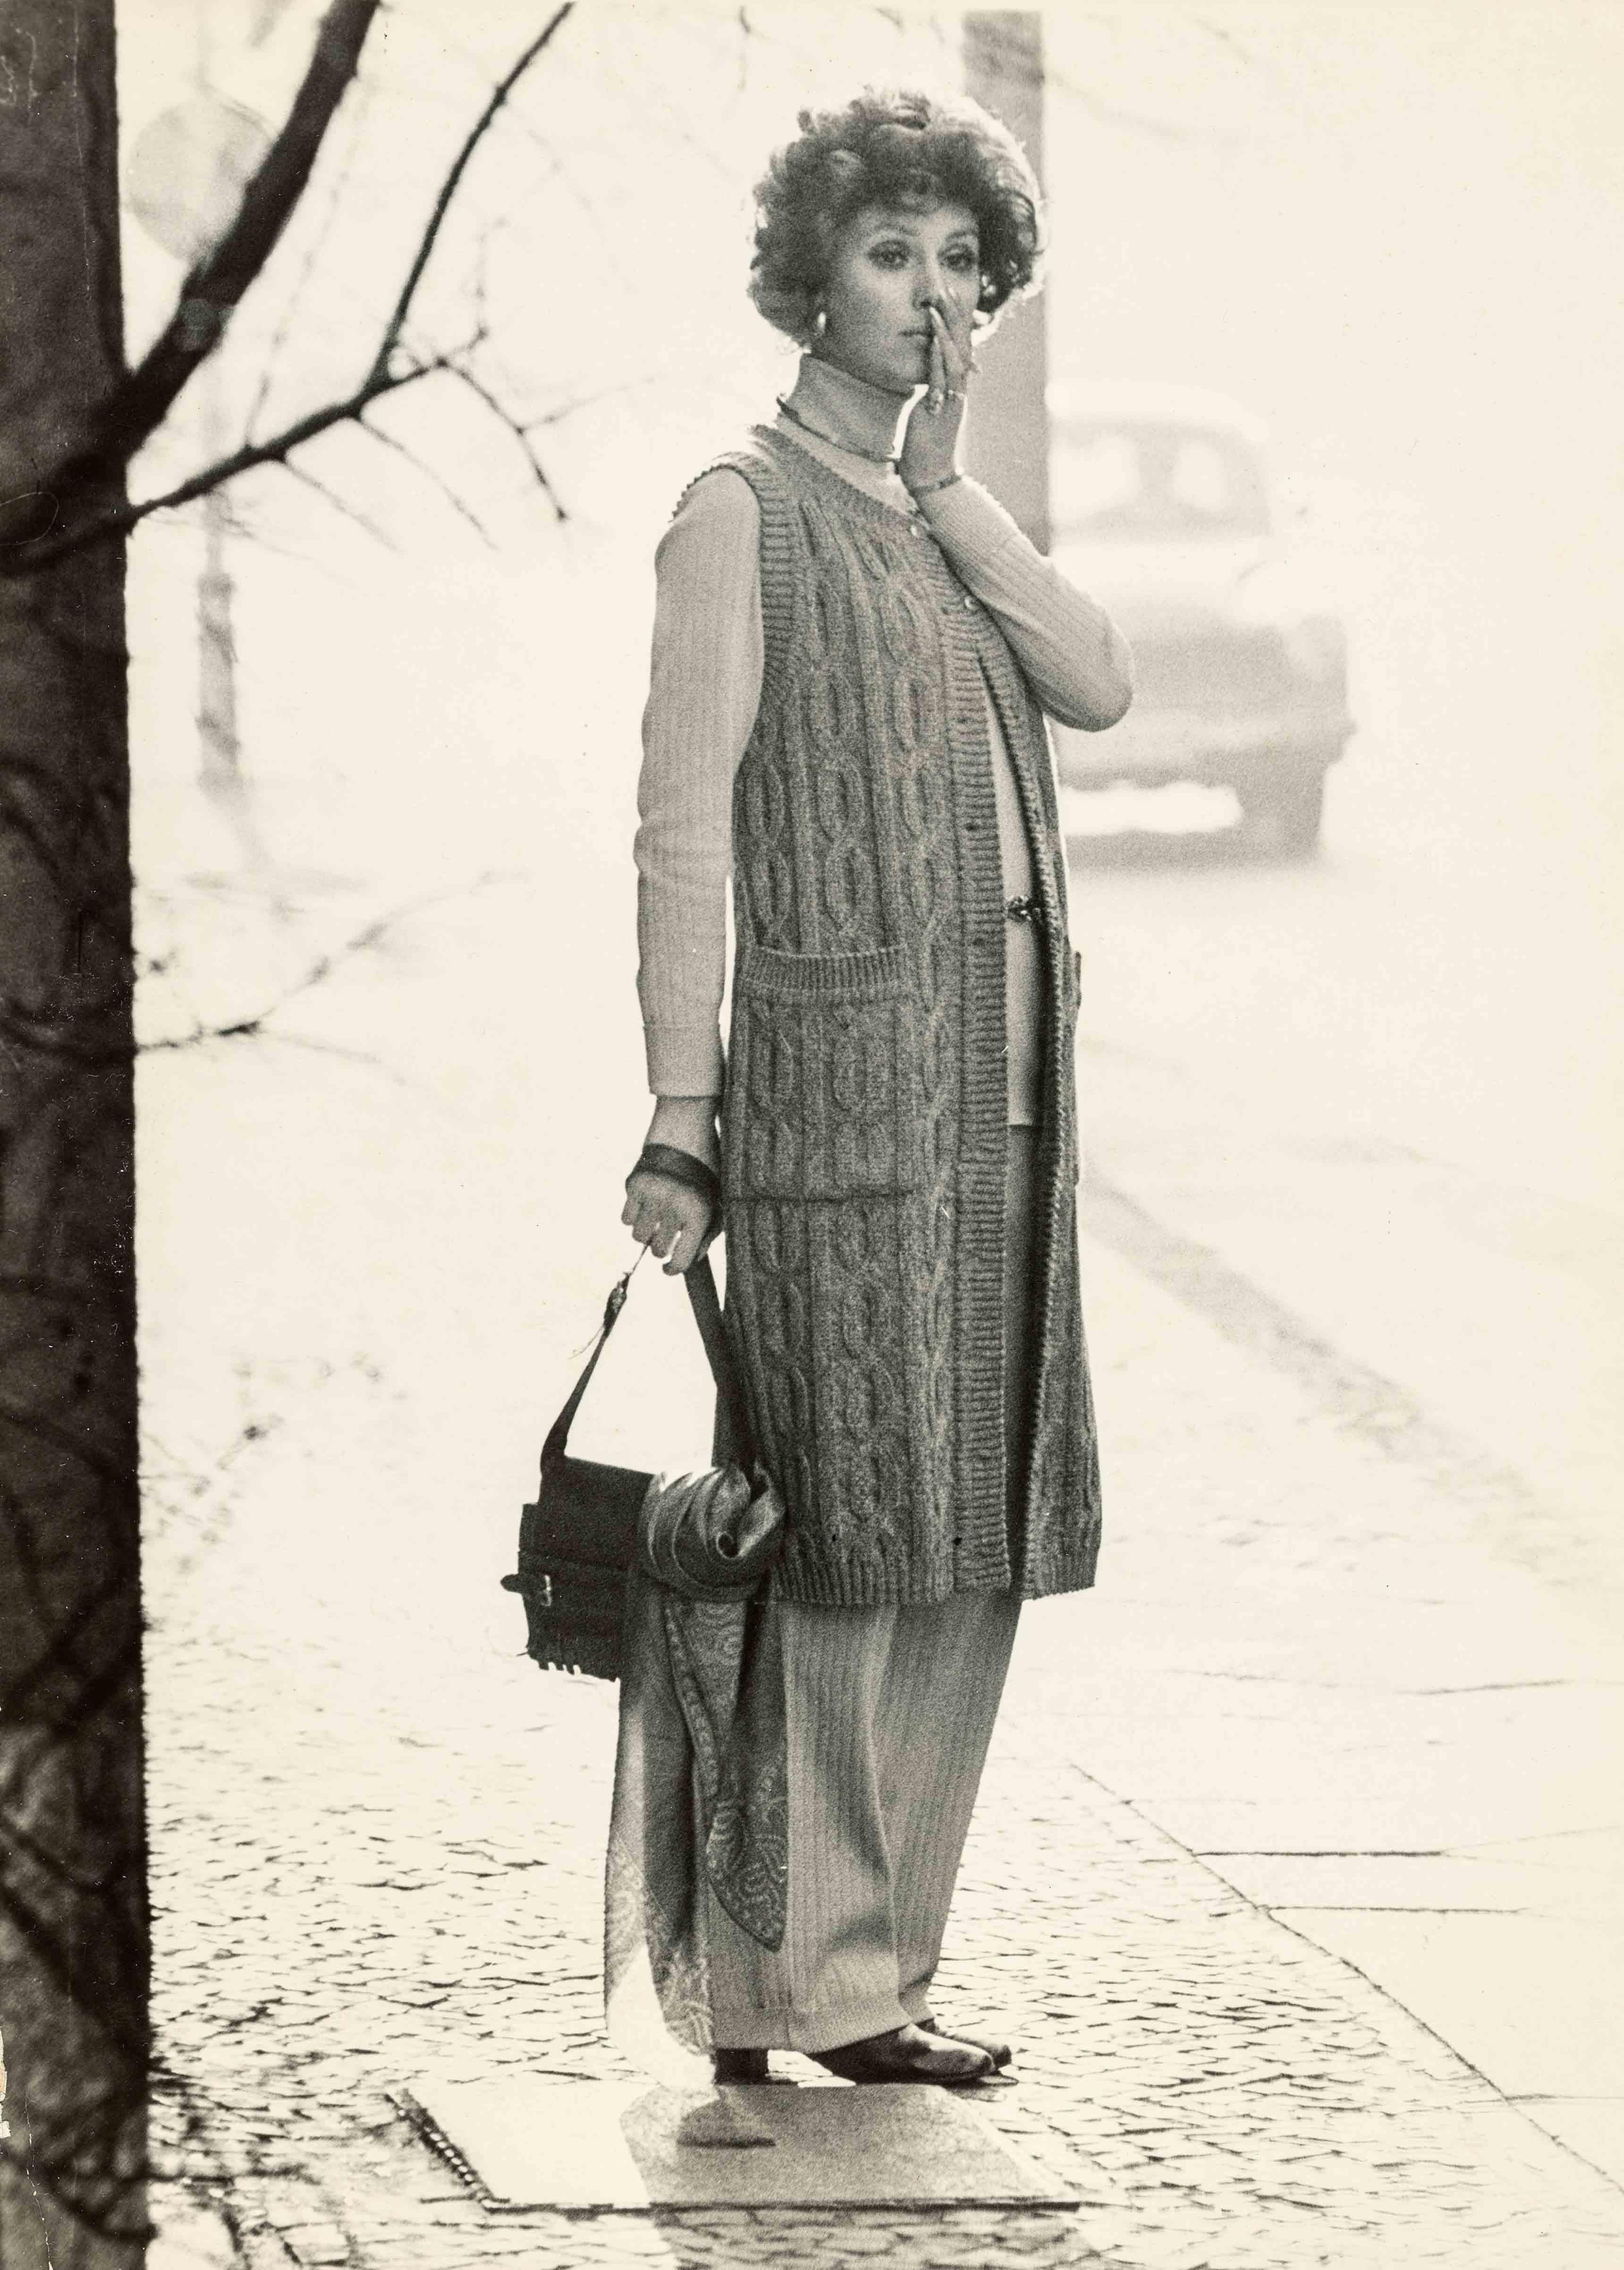 Knitwear fashion | vintage print | 15,6 x 11,7 in | model: German Fashion Institute | 'Sibylle', issue 4, 1971 Galerie Berinson, Berlin